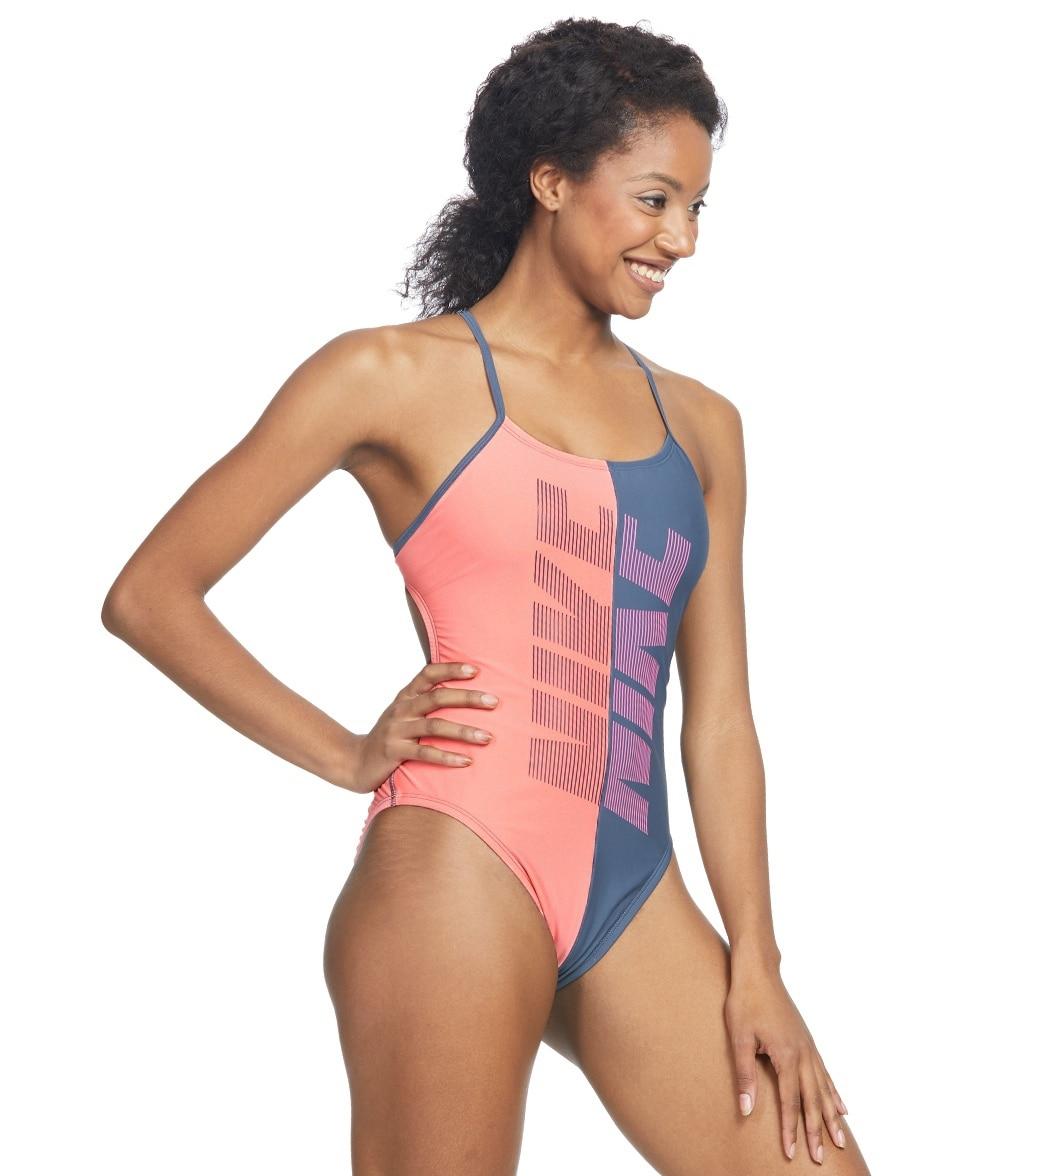 ac319d3f0e Nike Women s Rift Cut Out One Piece Swimsuit at SwimOutlet.com ...